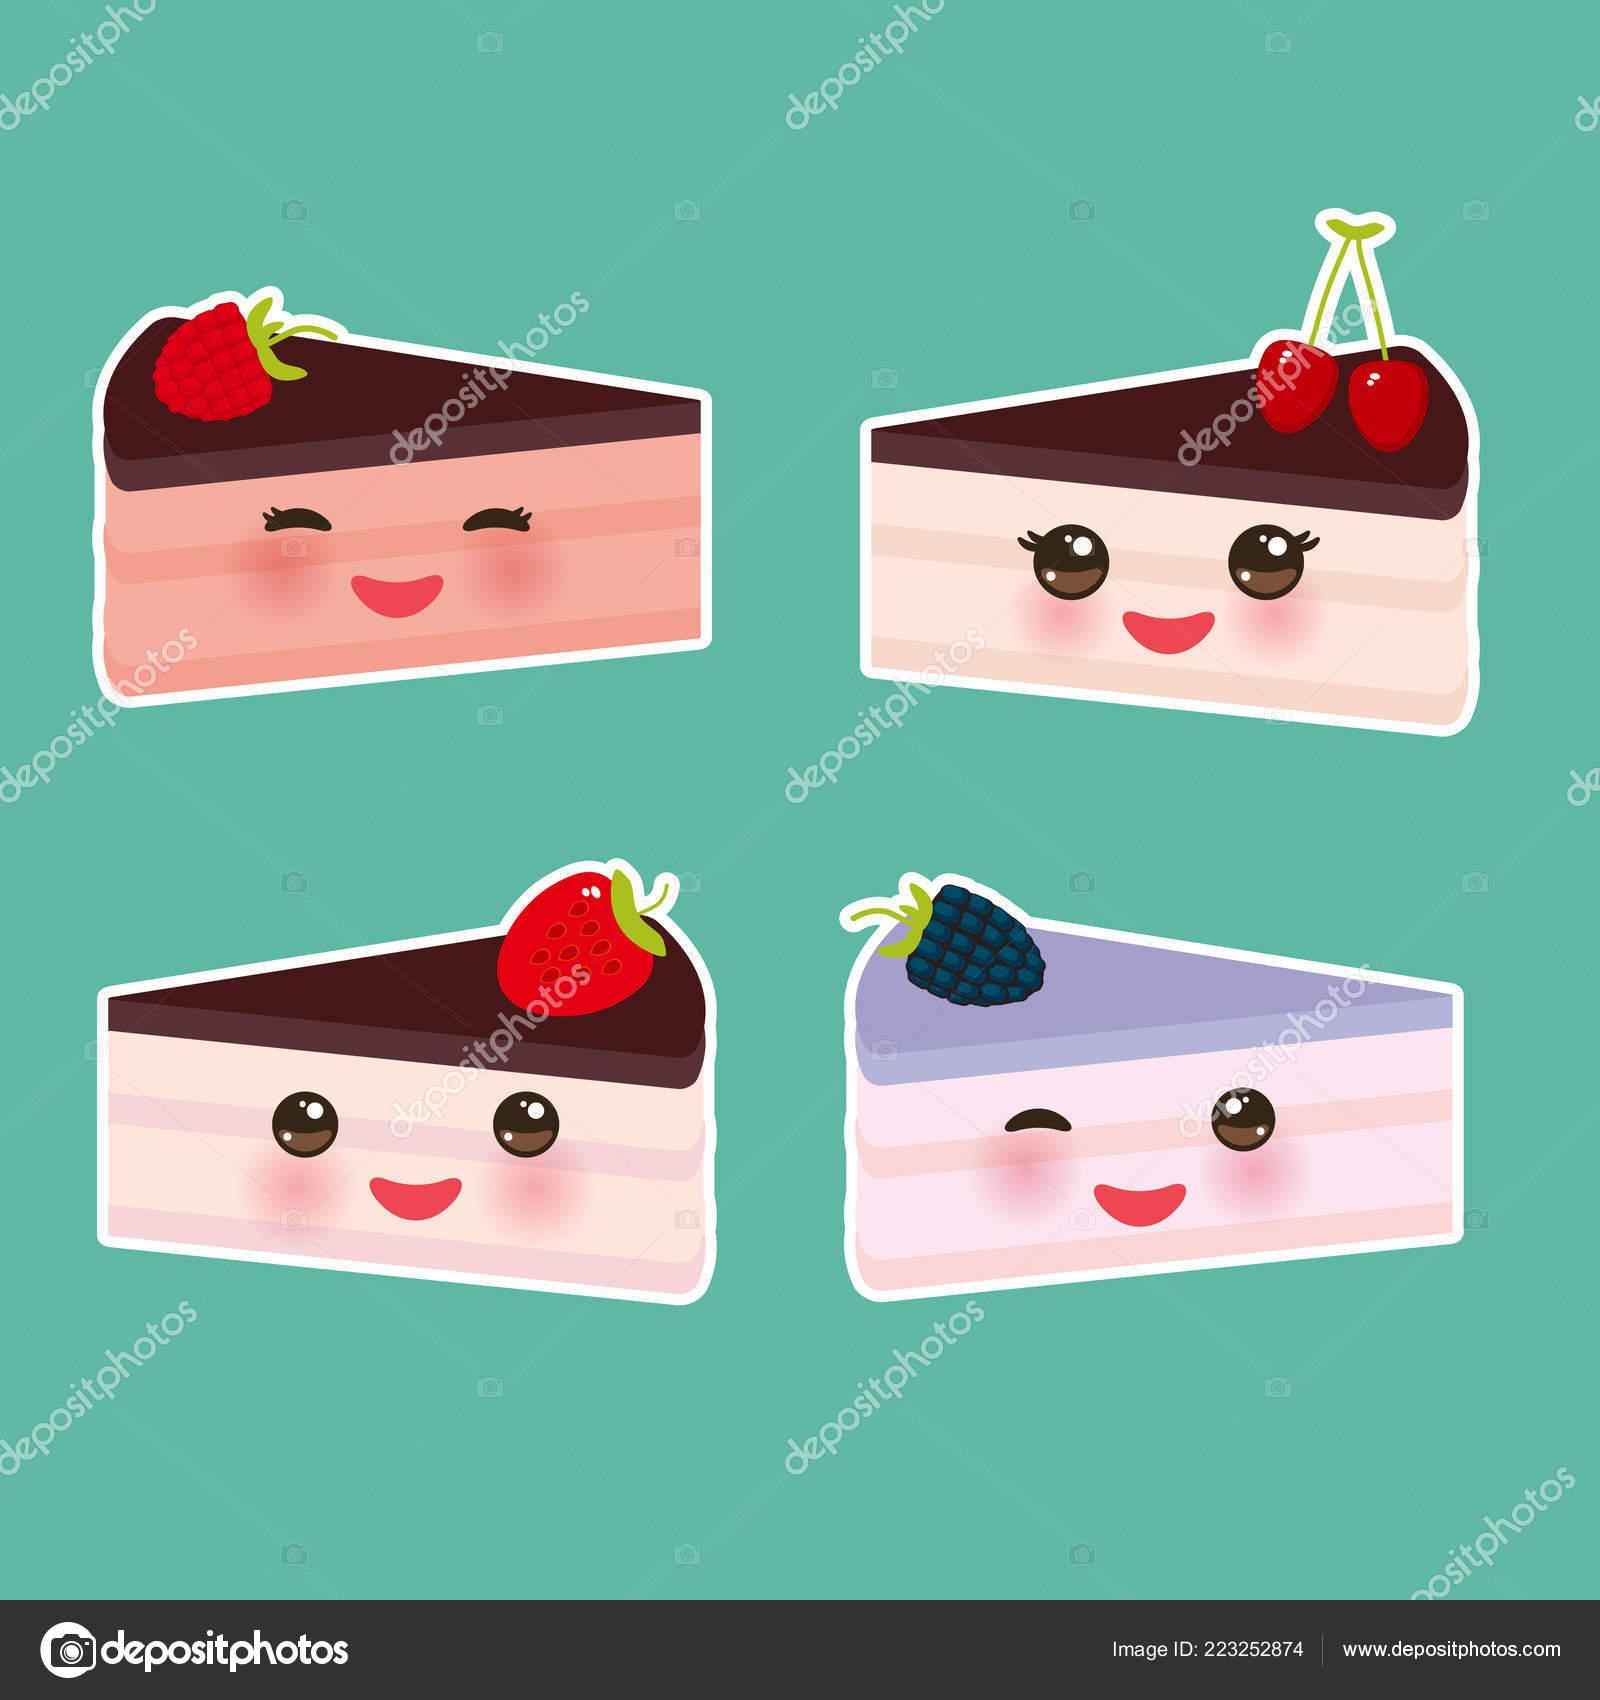 Kawaii Cute Fresca Fresa Cereza Frambuesa Zarzamora Pastel Juego